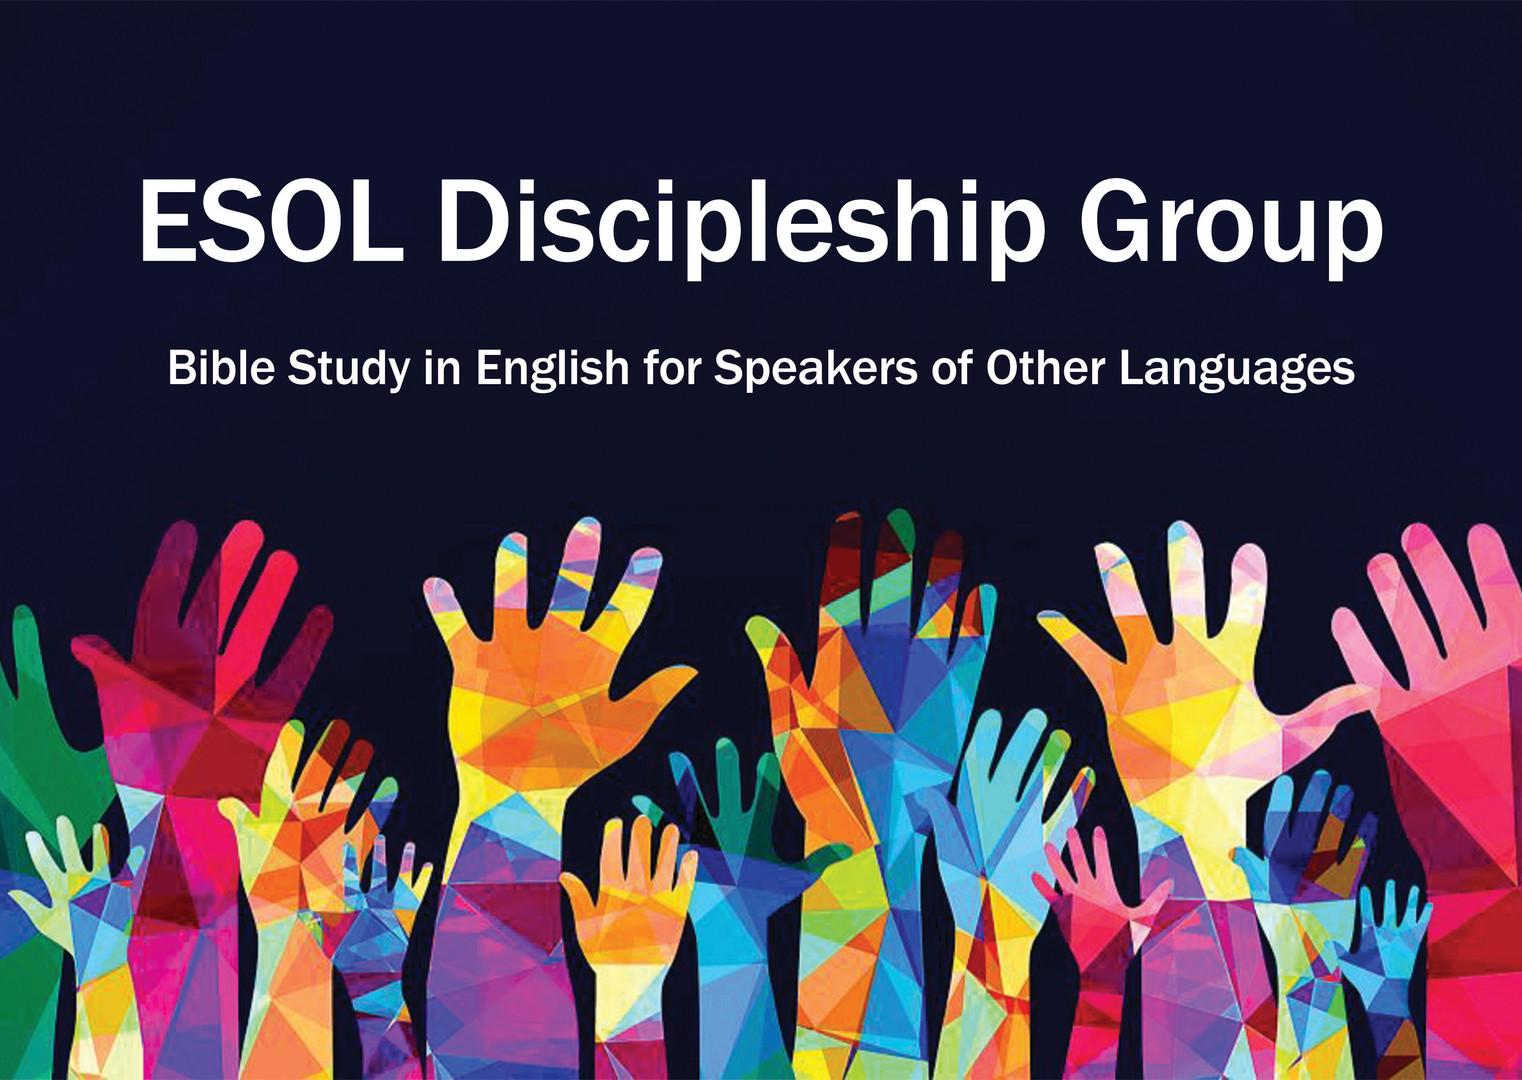 ESOL discipleship group